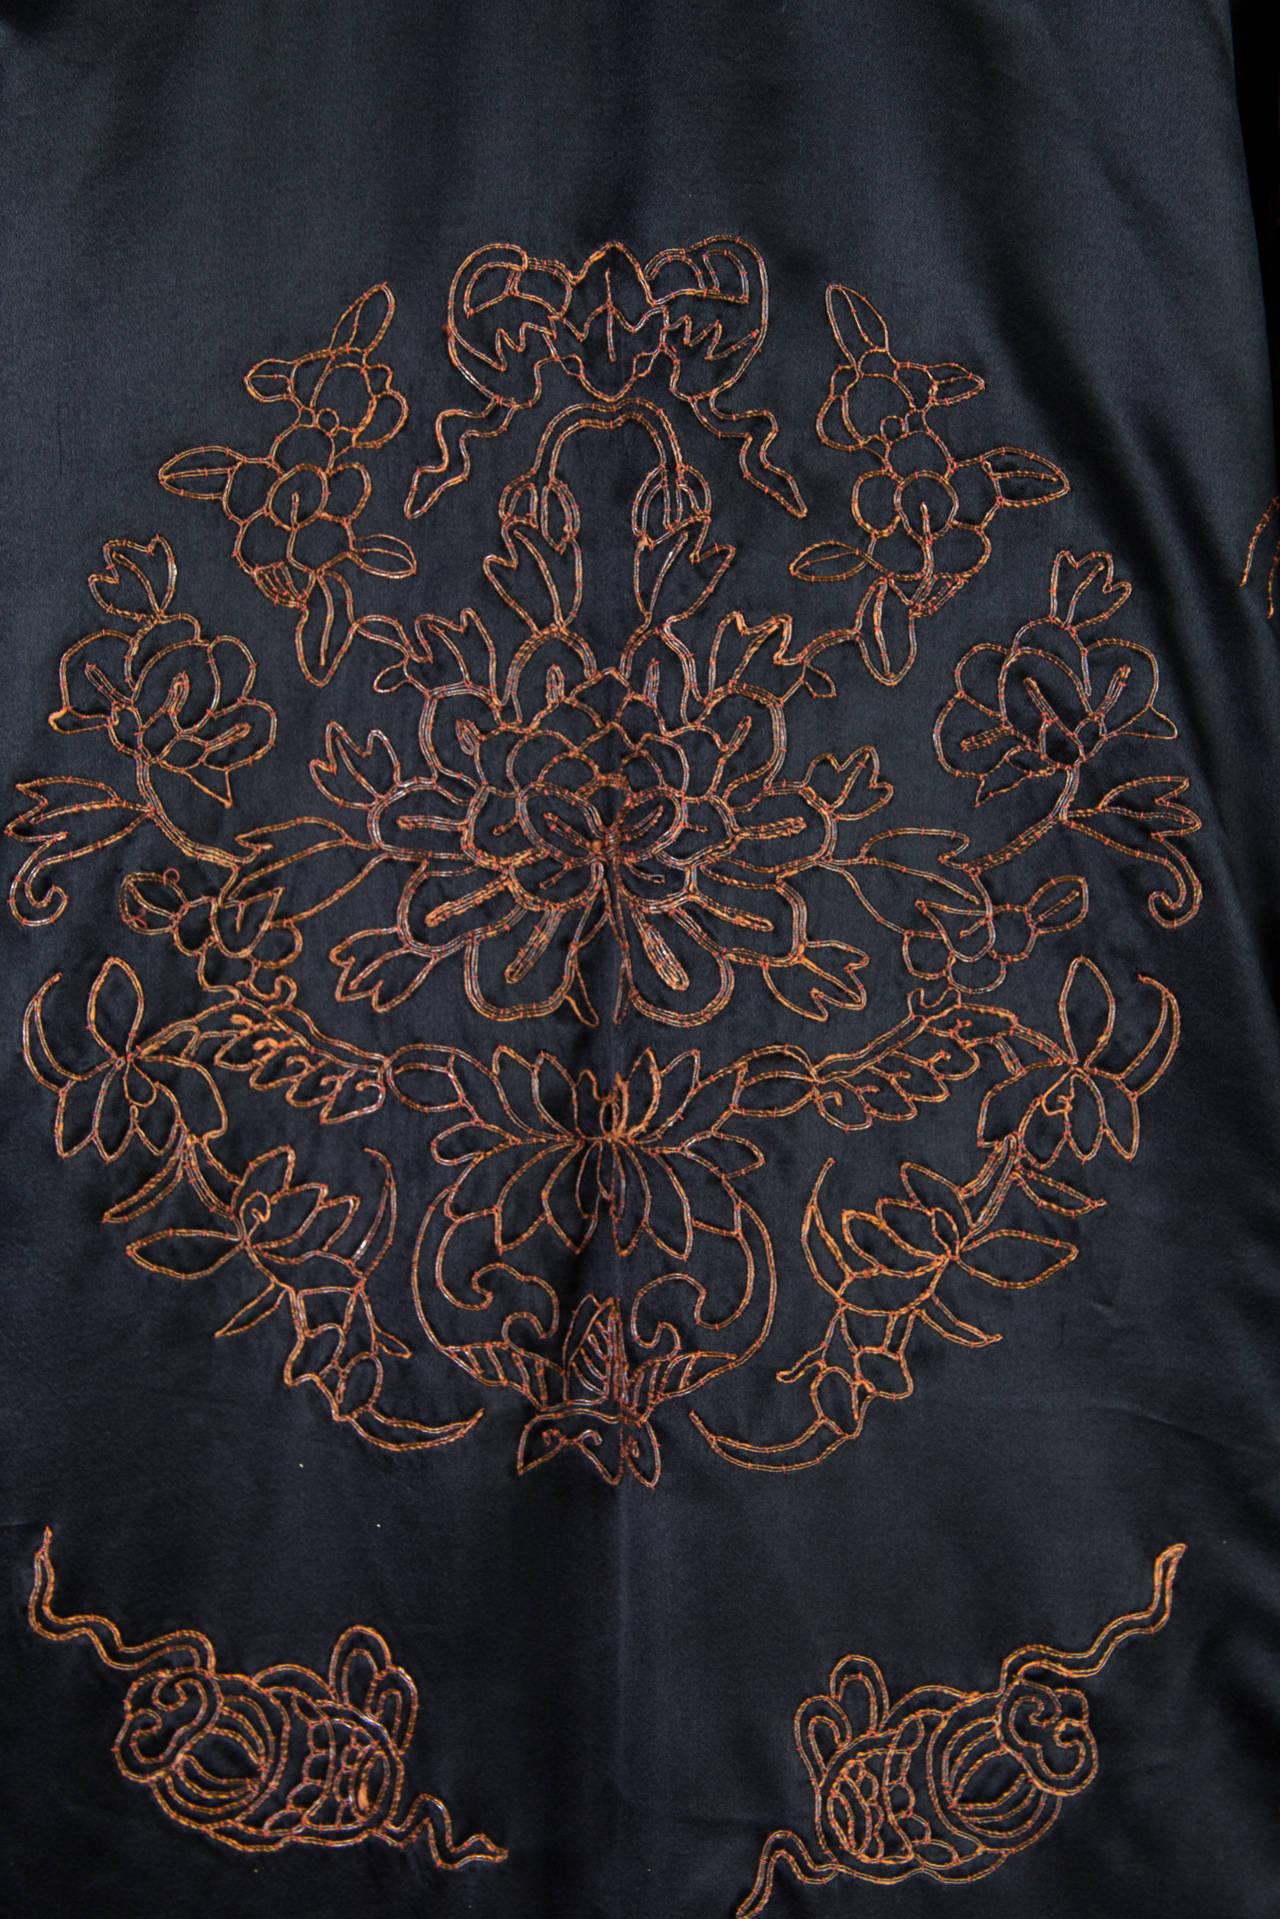 Early Chinese Embroidered Jacket Kimono style 10